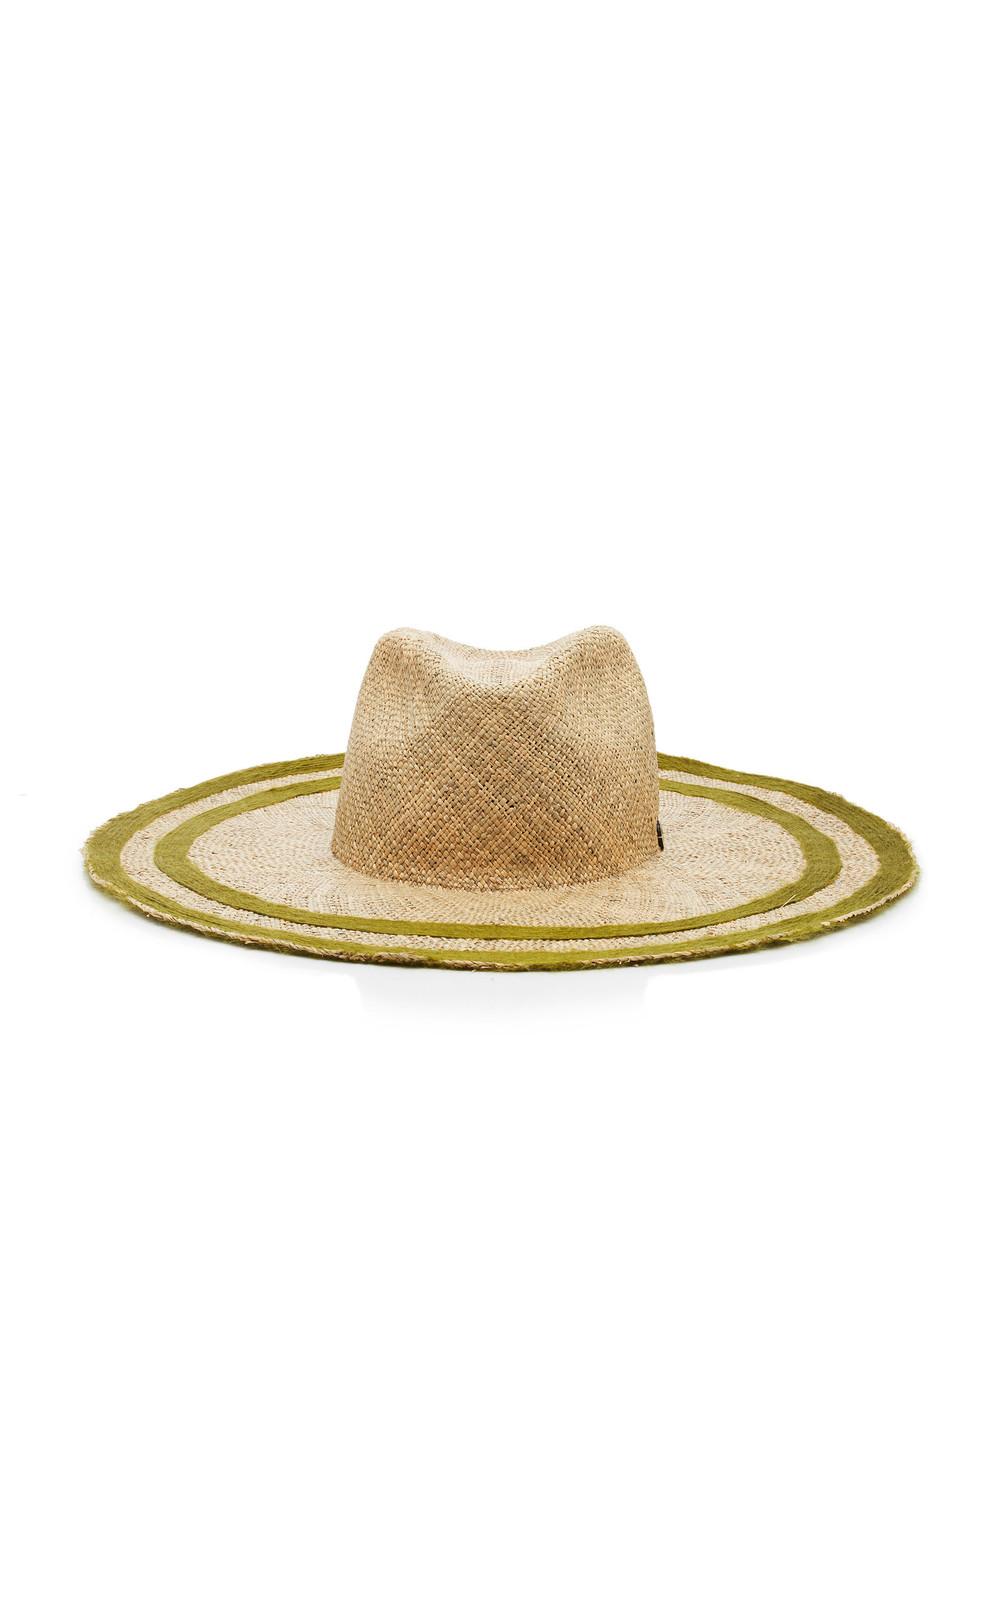 Filu Hats Capri AG Straw Hat in green